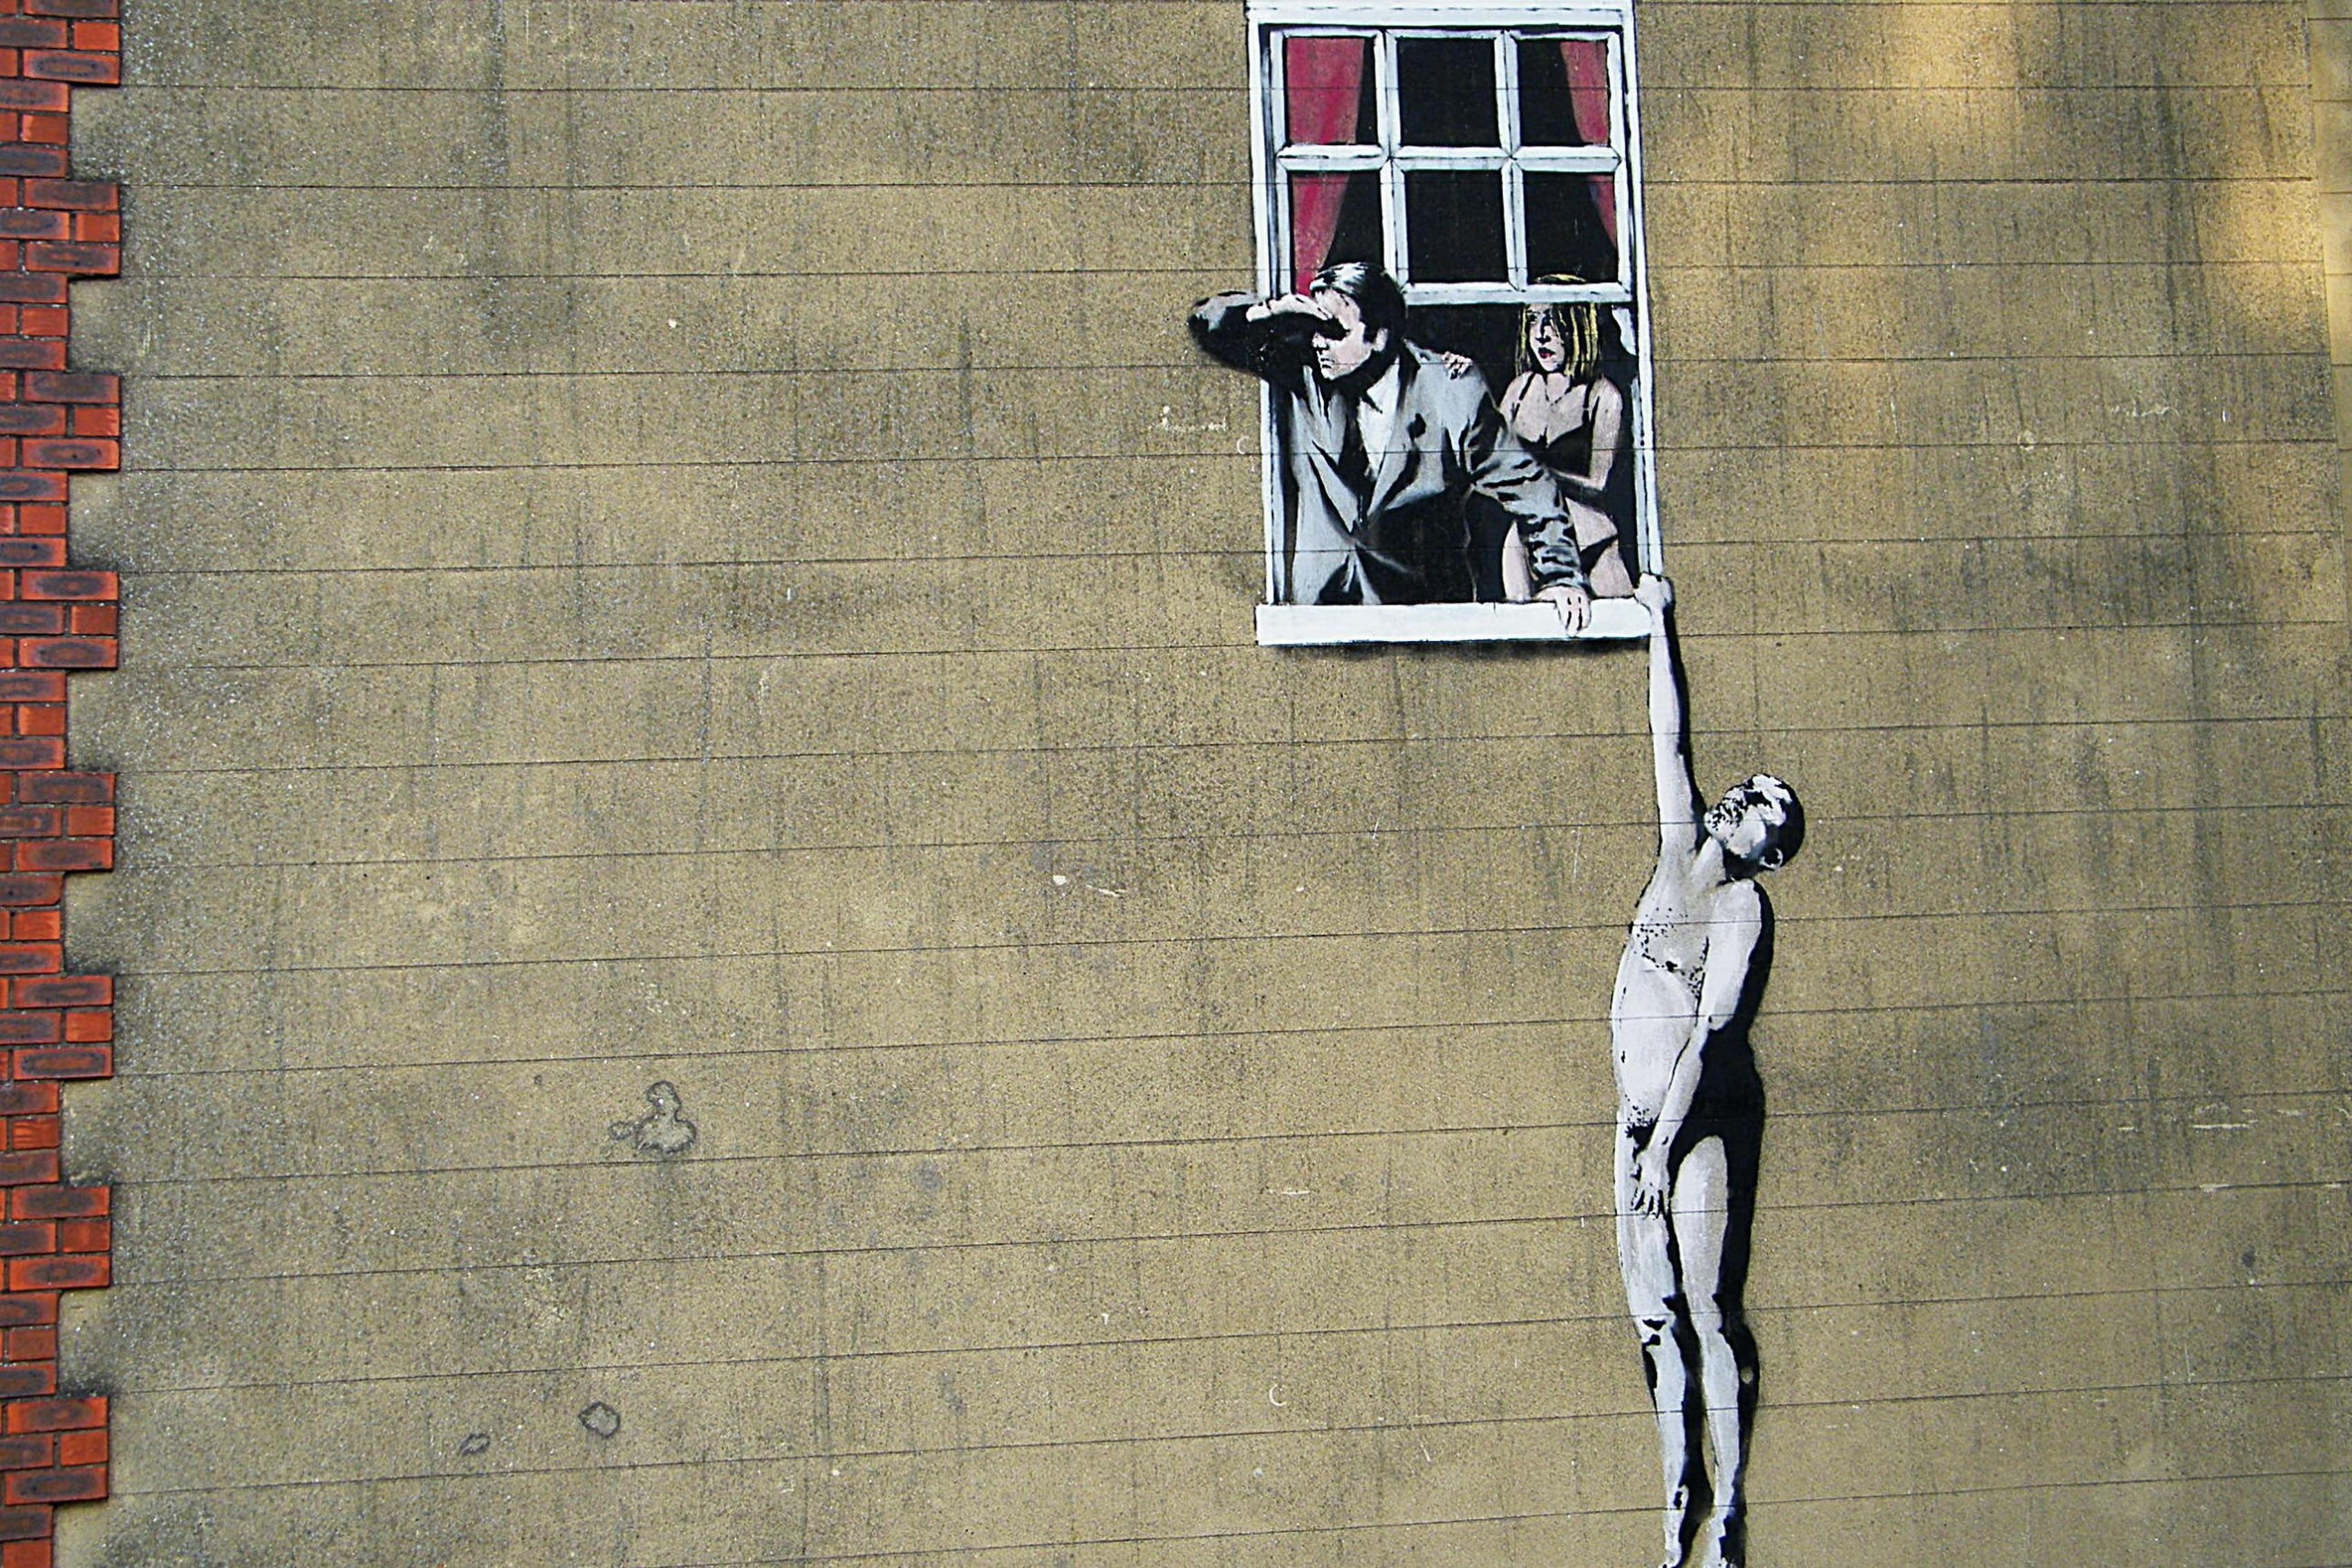 Graffiti art on wood - Banksy Graffiti The Situation Living Room Home Art Decor Wood Frame Fabric Poster Accept Customization